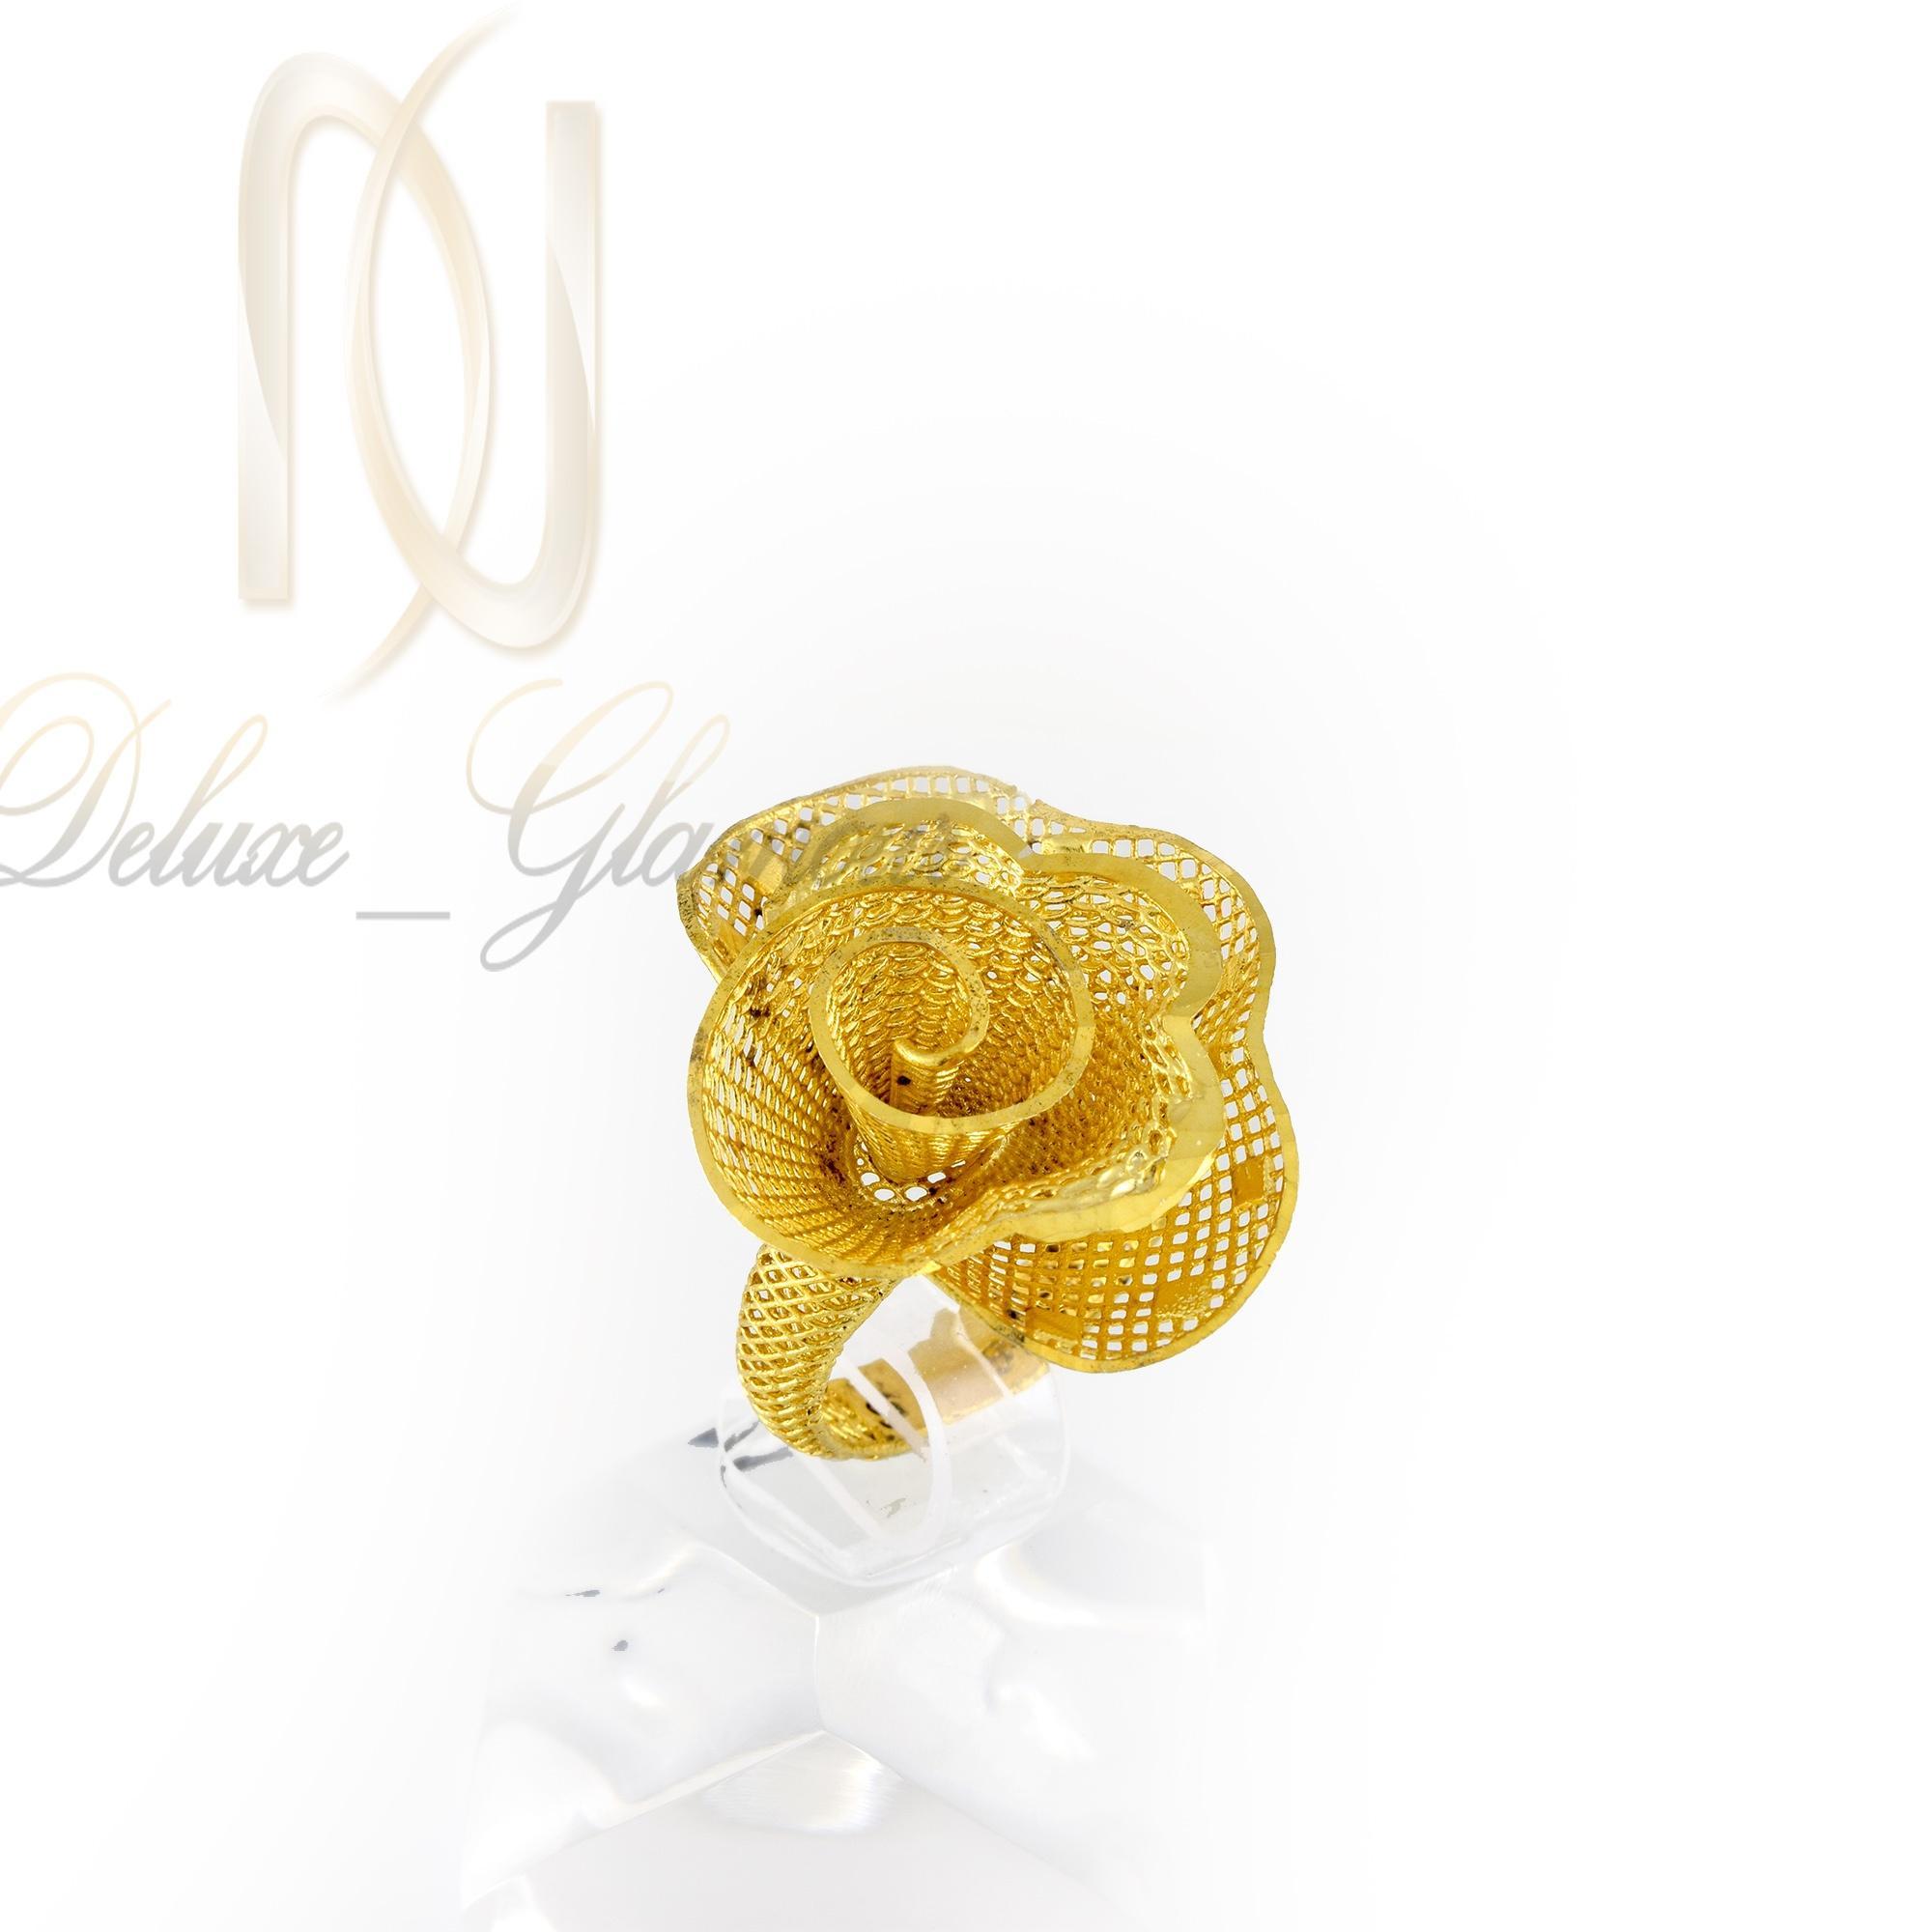 انگشتر نقره زنانه طلایی طرح گل rg-n311